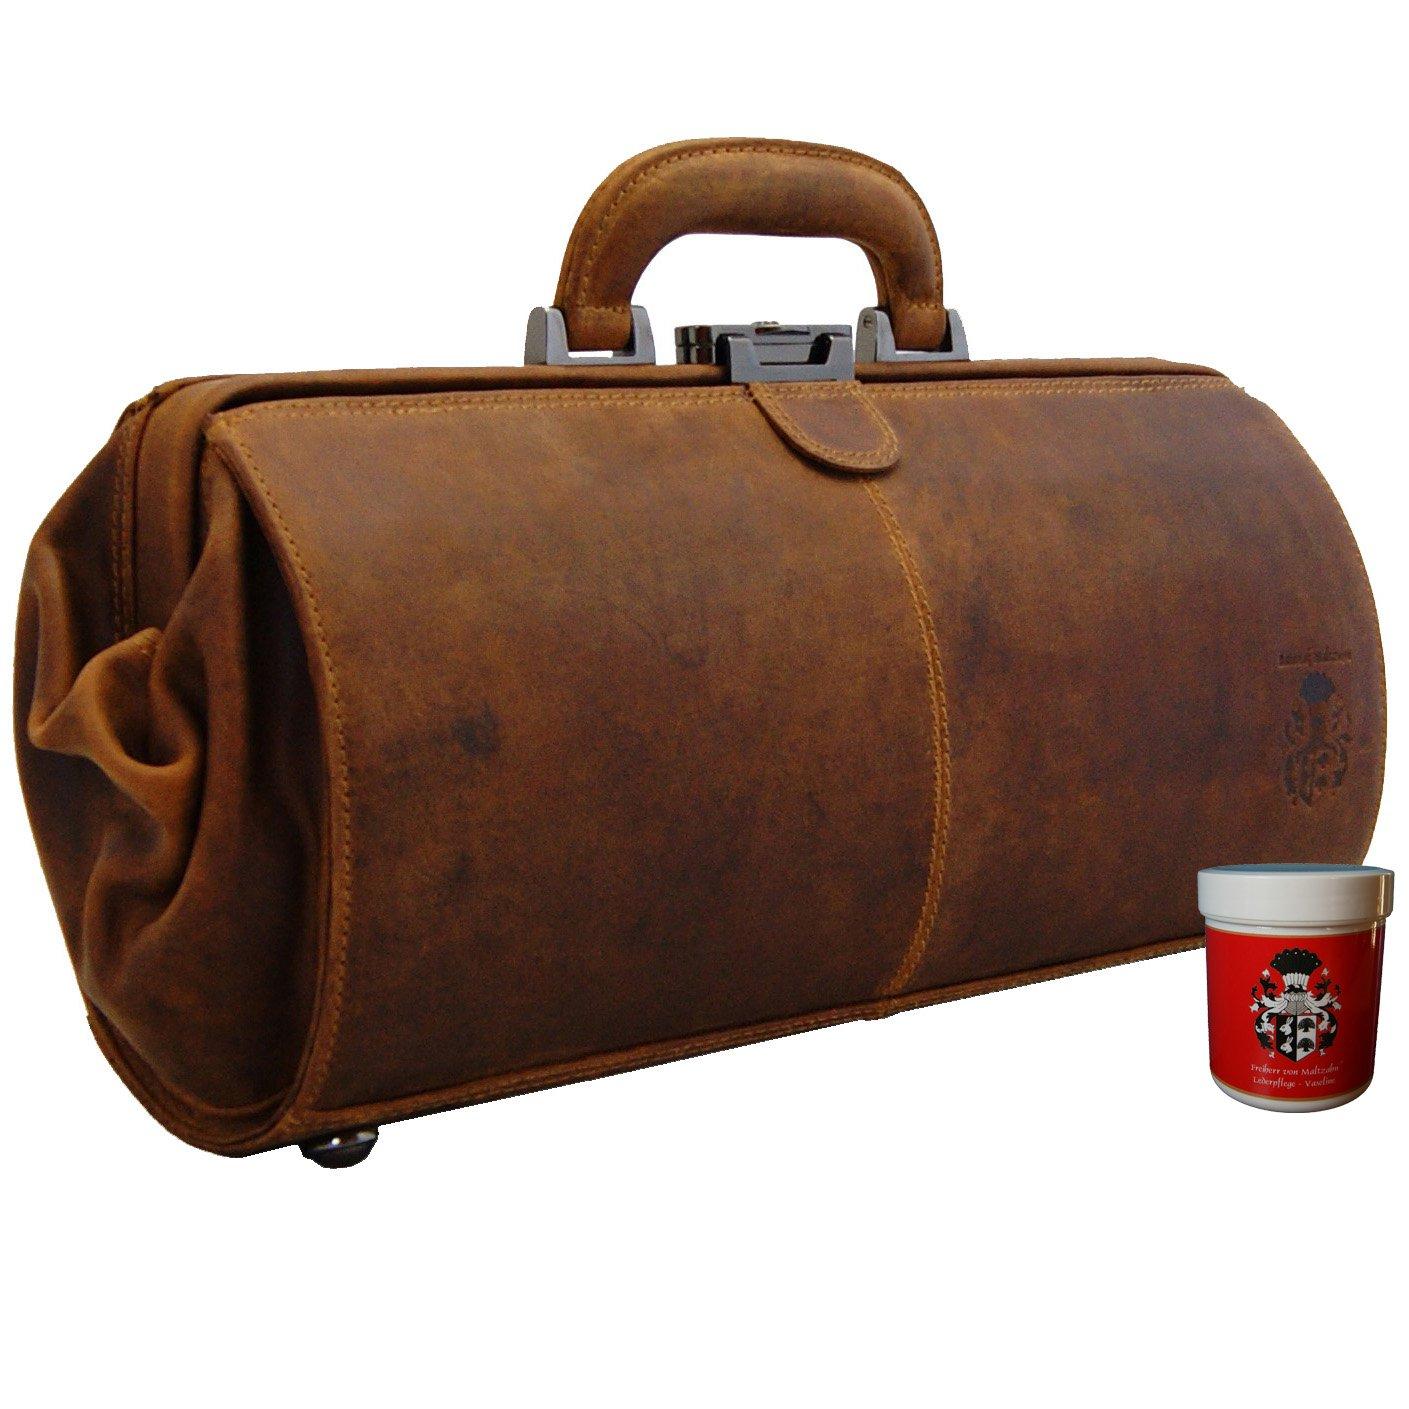 BARON de MALTZAHN - Sac de médecin SCHWEITZER cuir marron compris les soins en cuir L629mvm